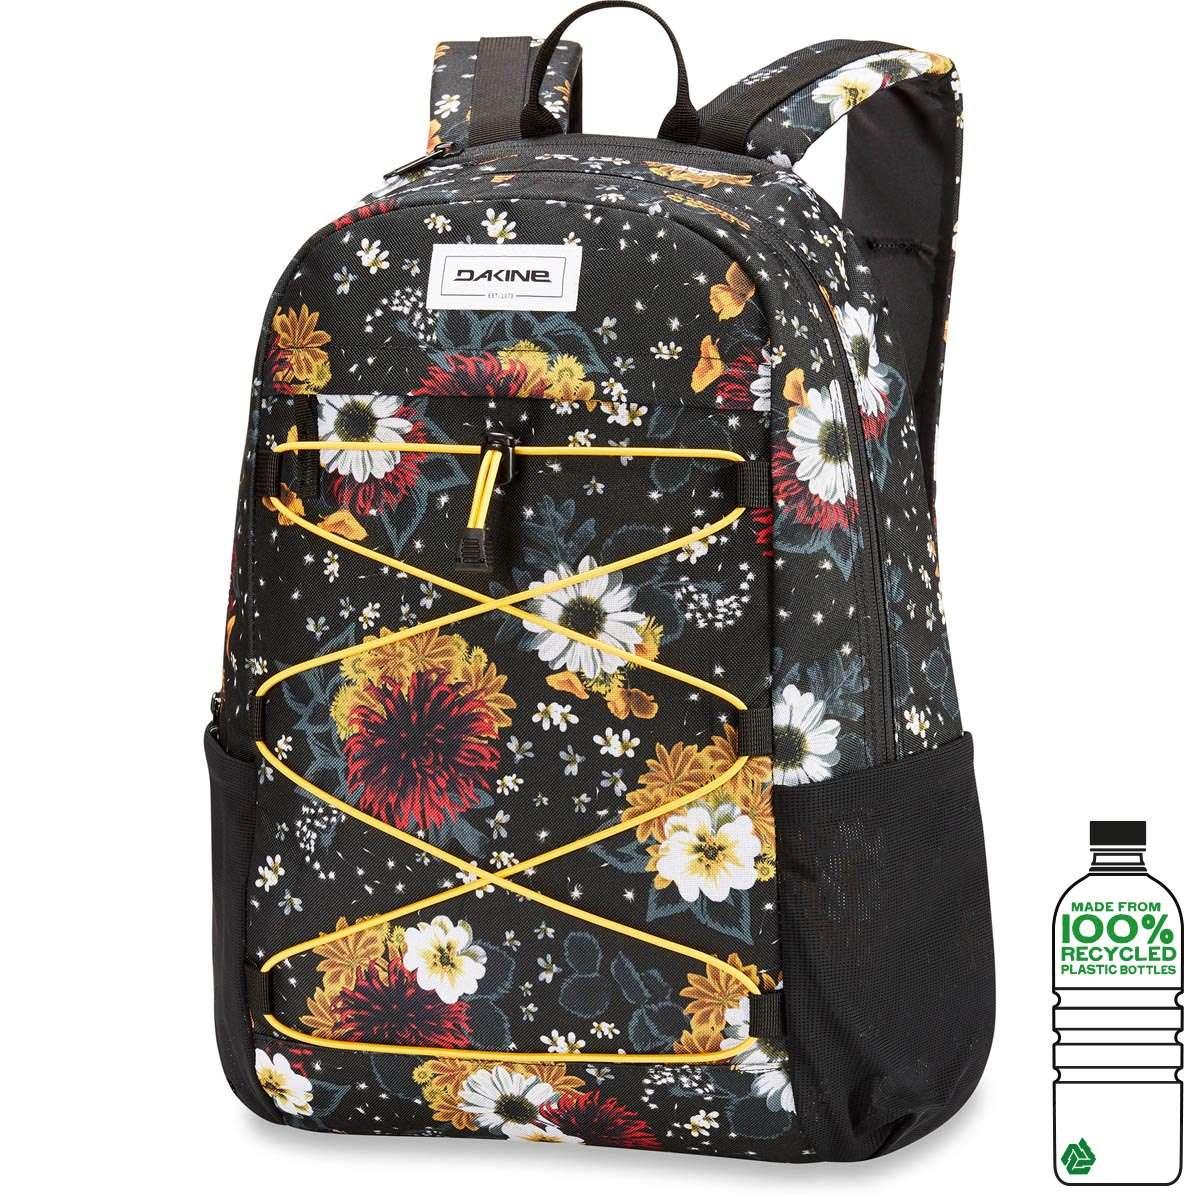 10a0a29f2d493 Dakine Wonder 22L Backpack Winter Daisy